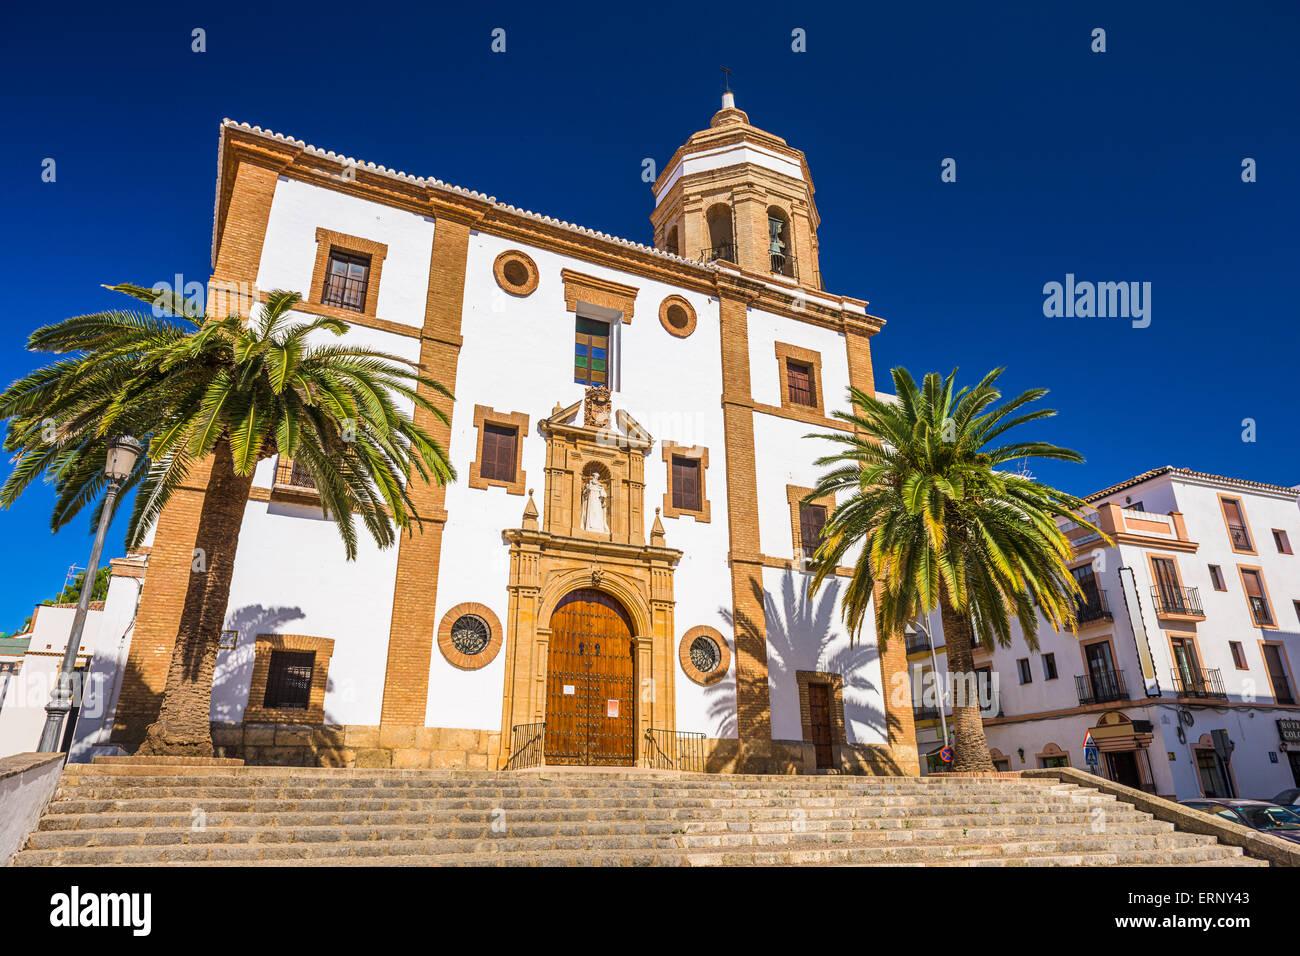 Ronda, España en el convento carmelita de Merced. Imagen De Stock